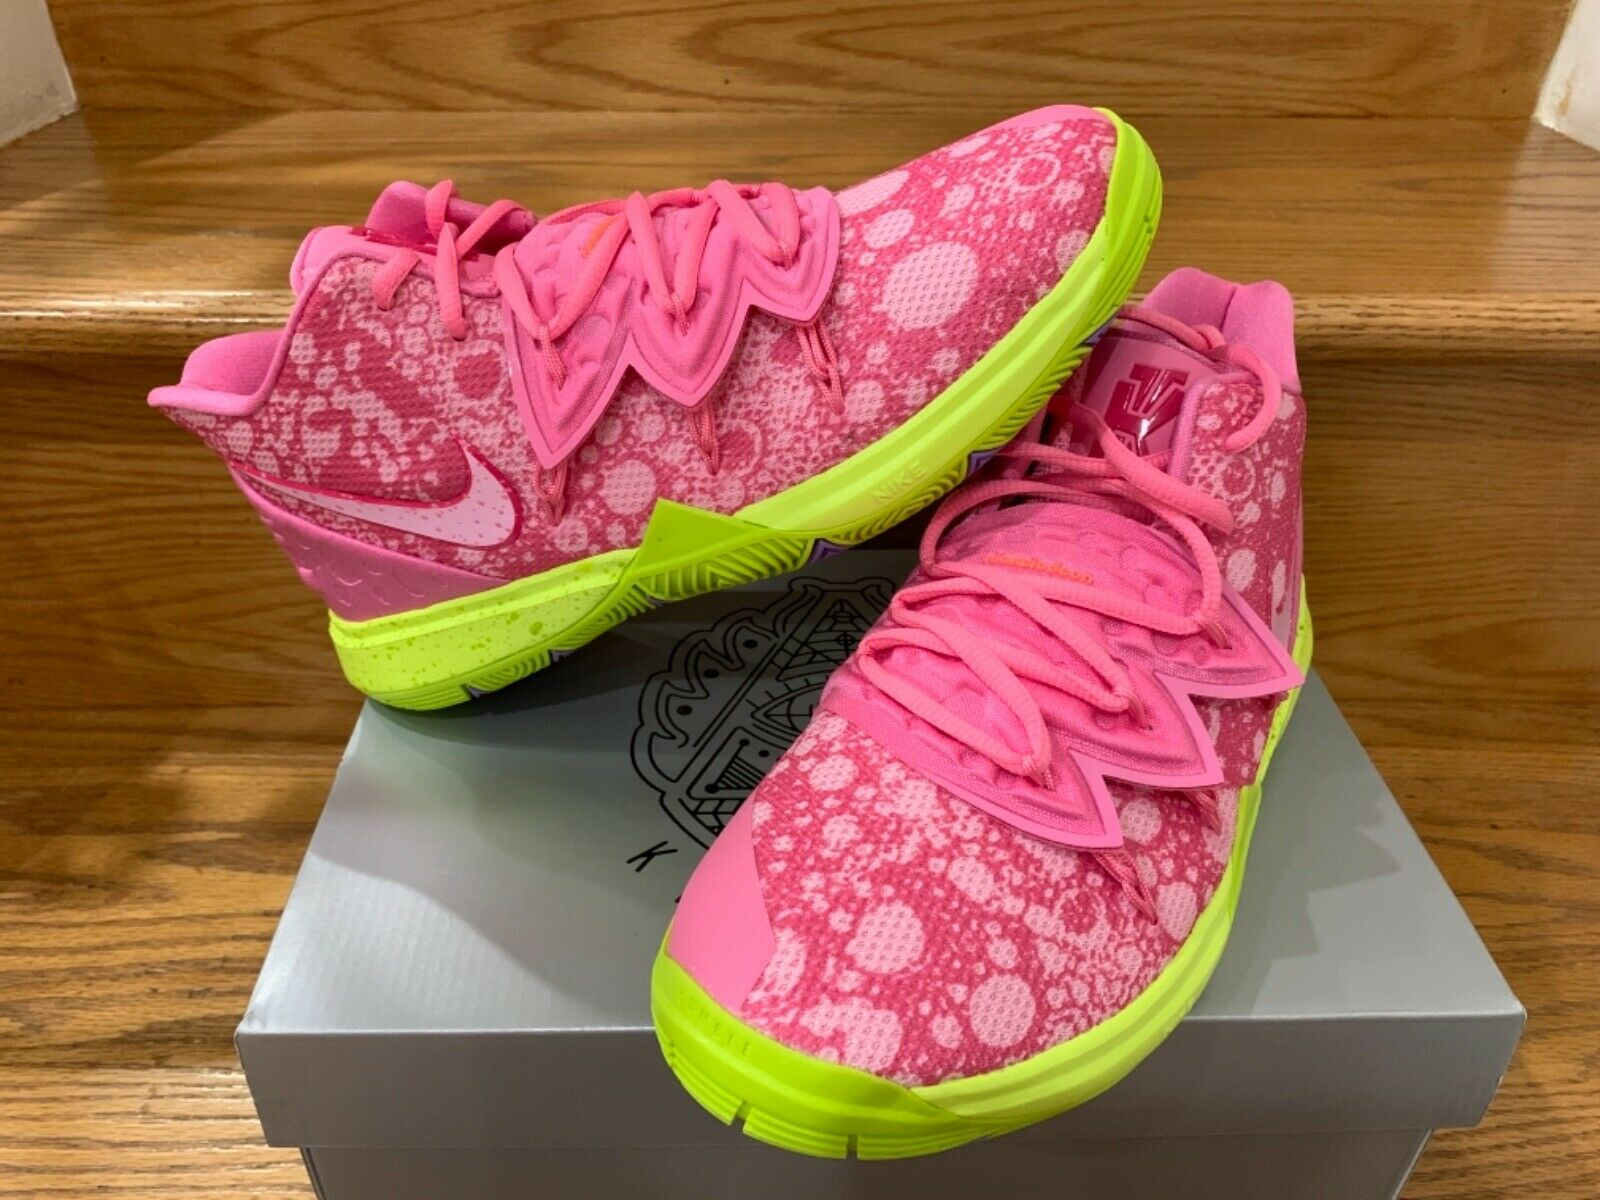 Nike Kyrie 5 Spongebob PS